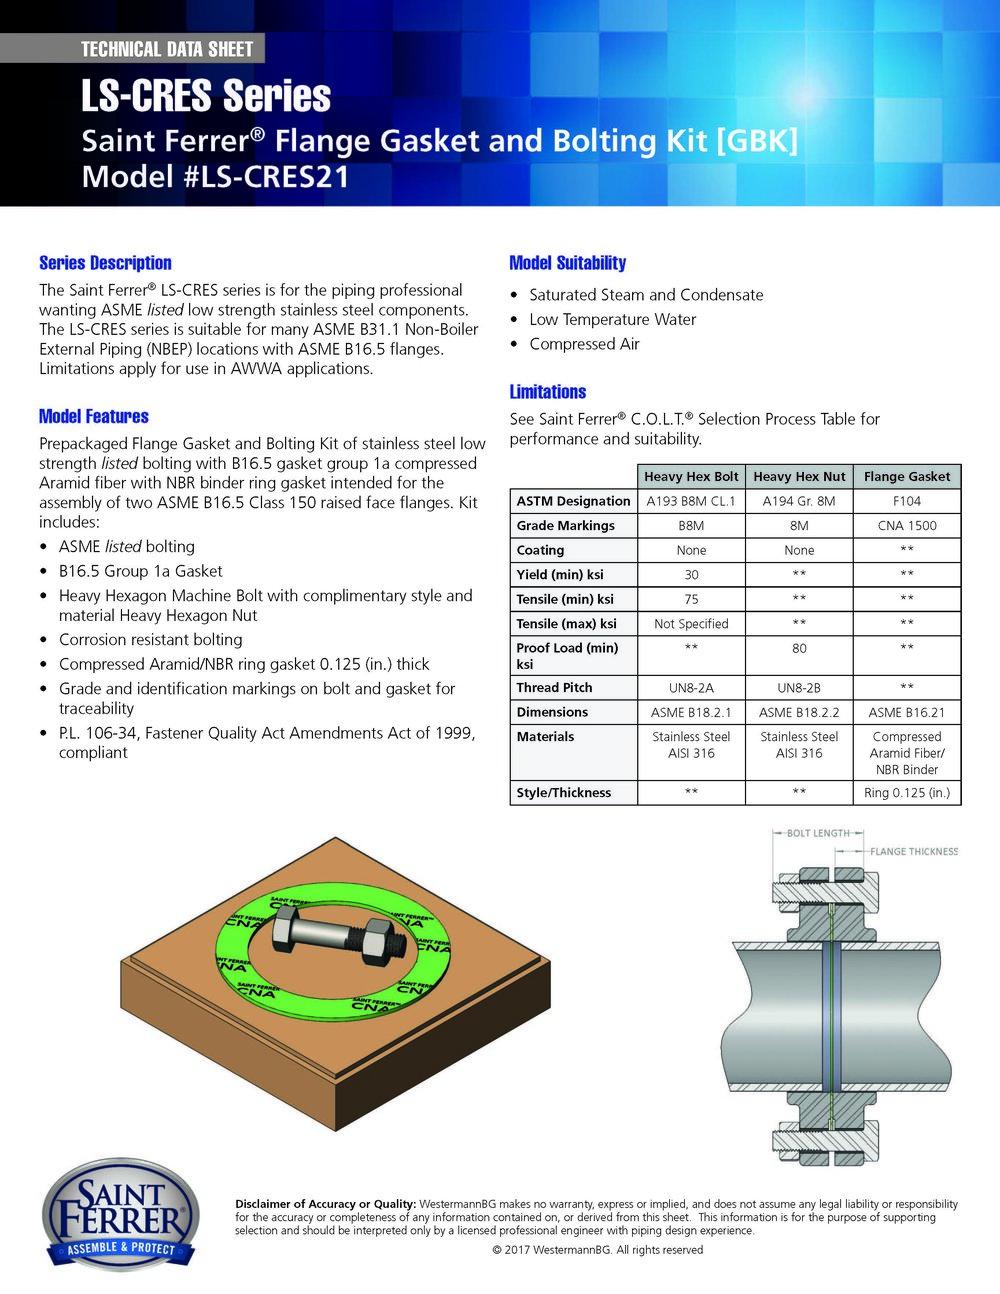 SF_Data_Sheet_LS-CRES_Series_LS-CRES21.jpg